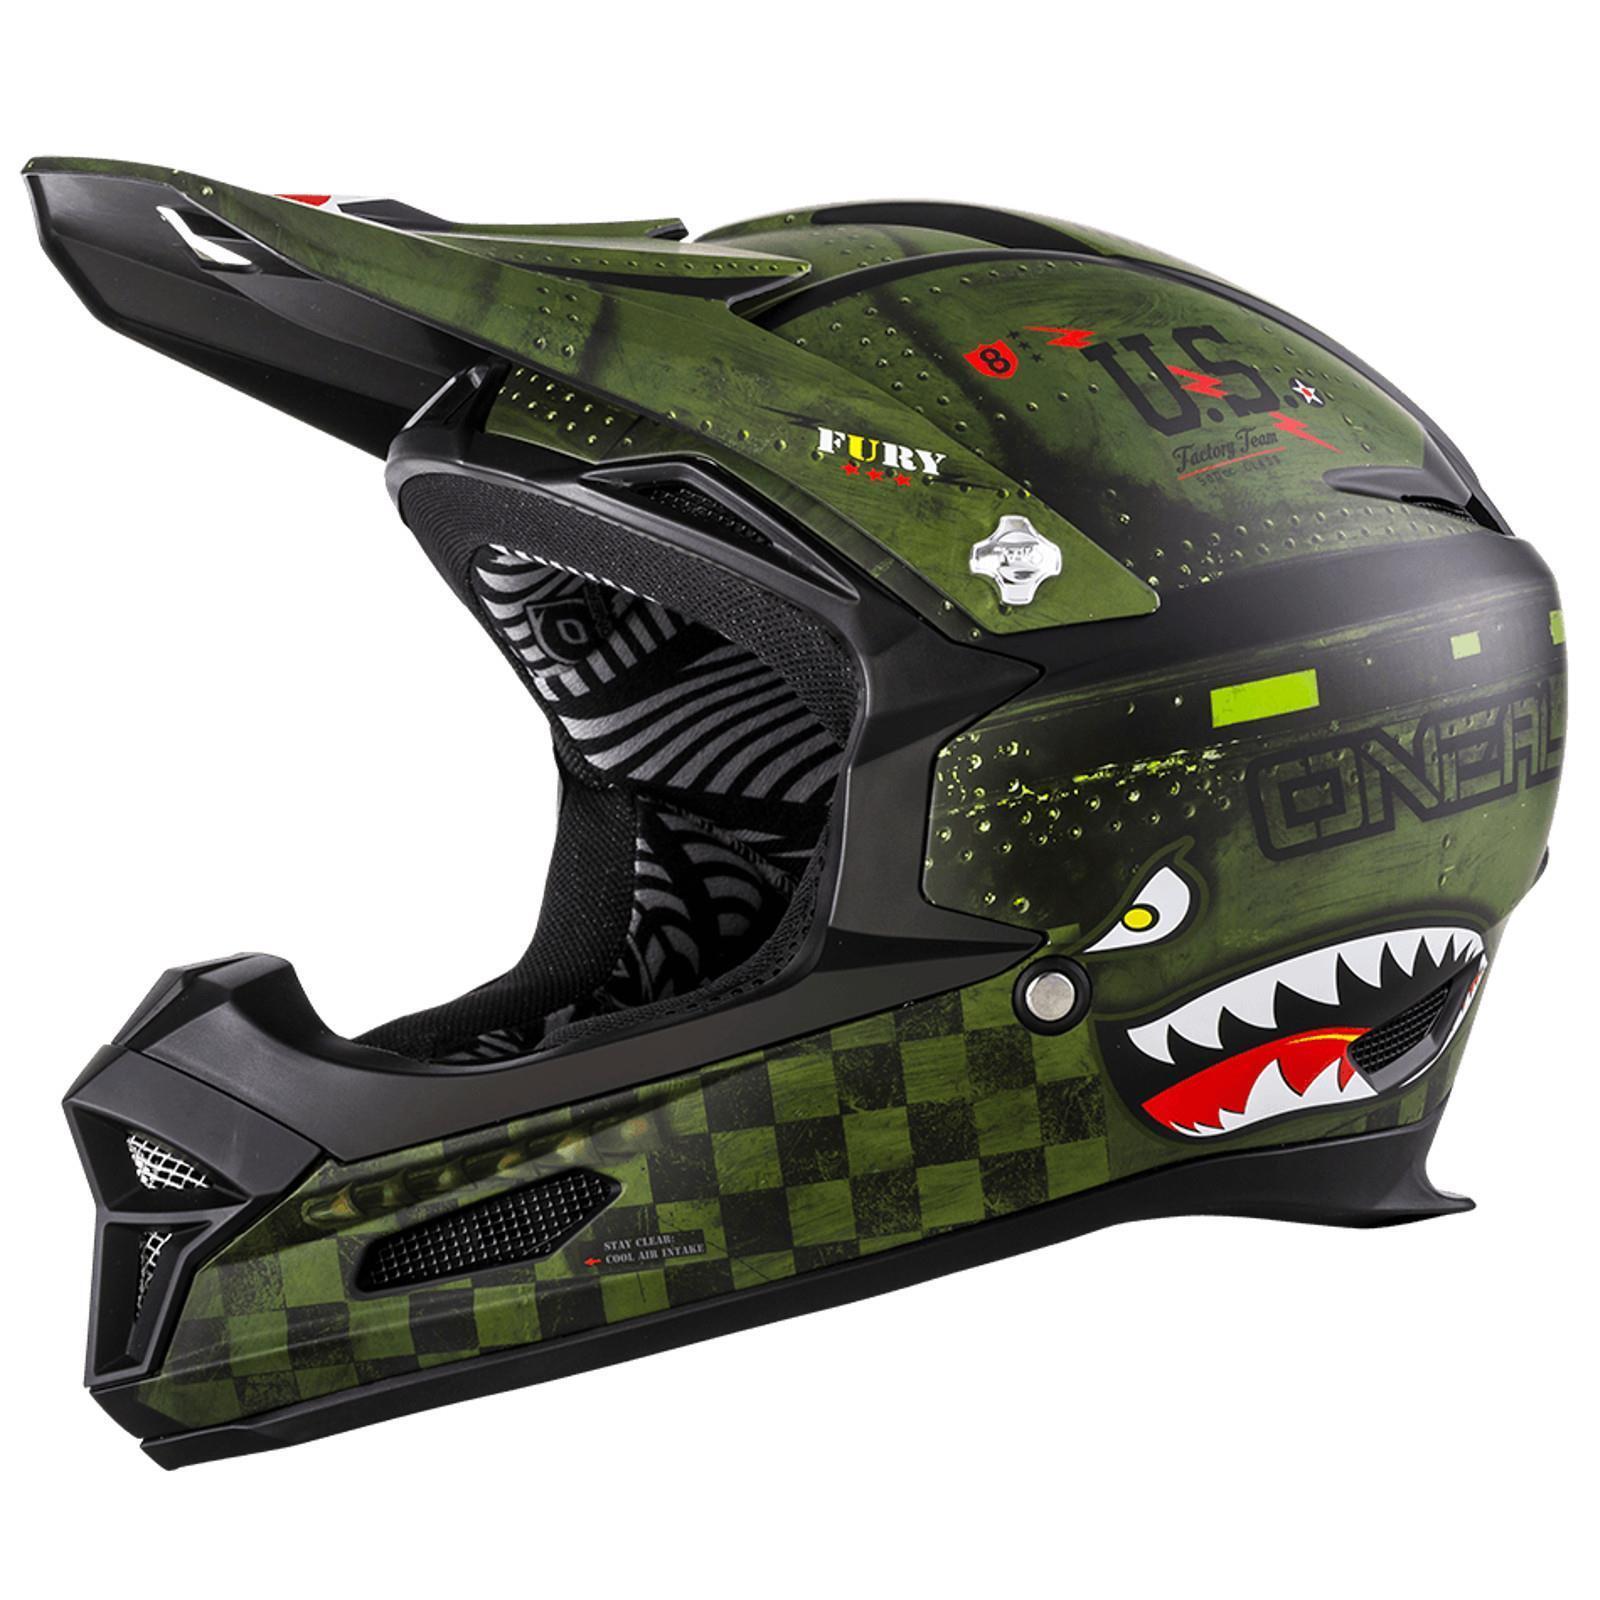 ONeal Fury RL Helm Warhawk Nato green Action Cam Mountainbike Downhill Fullface